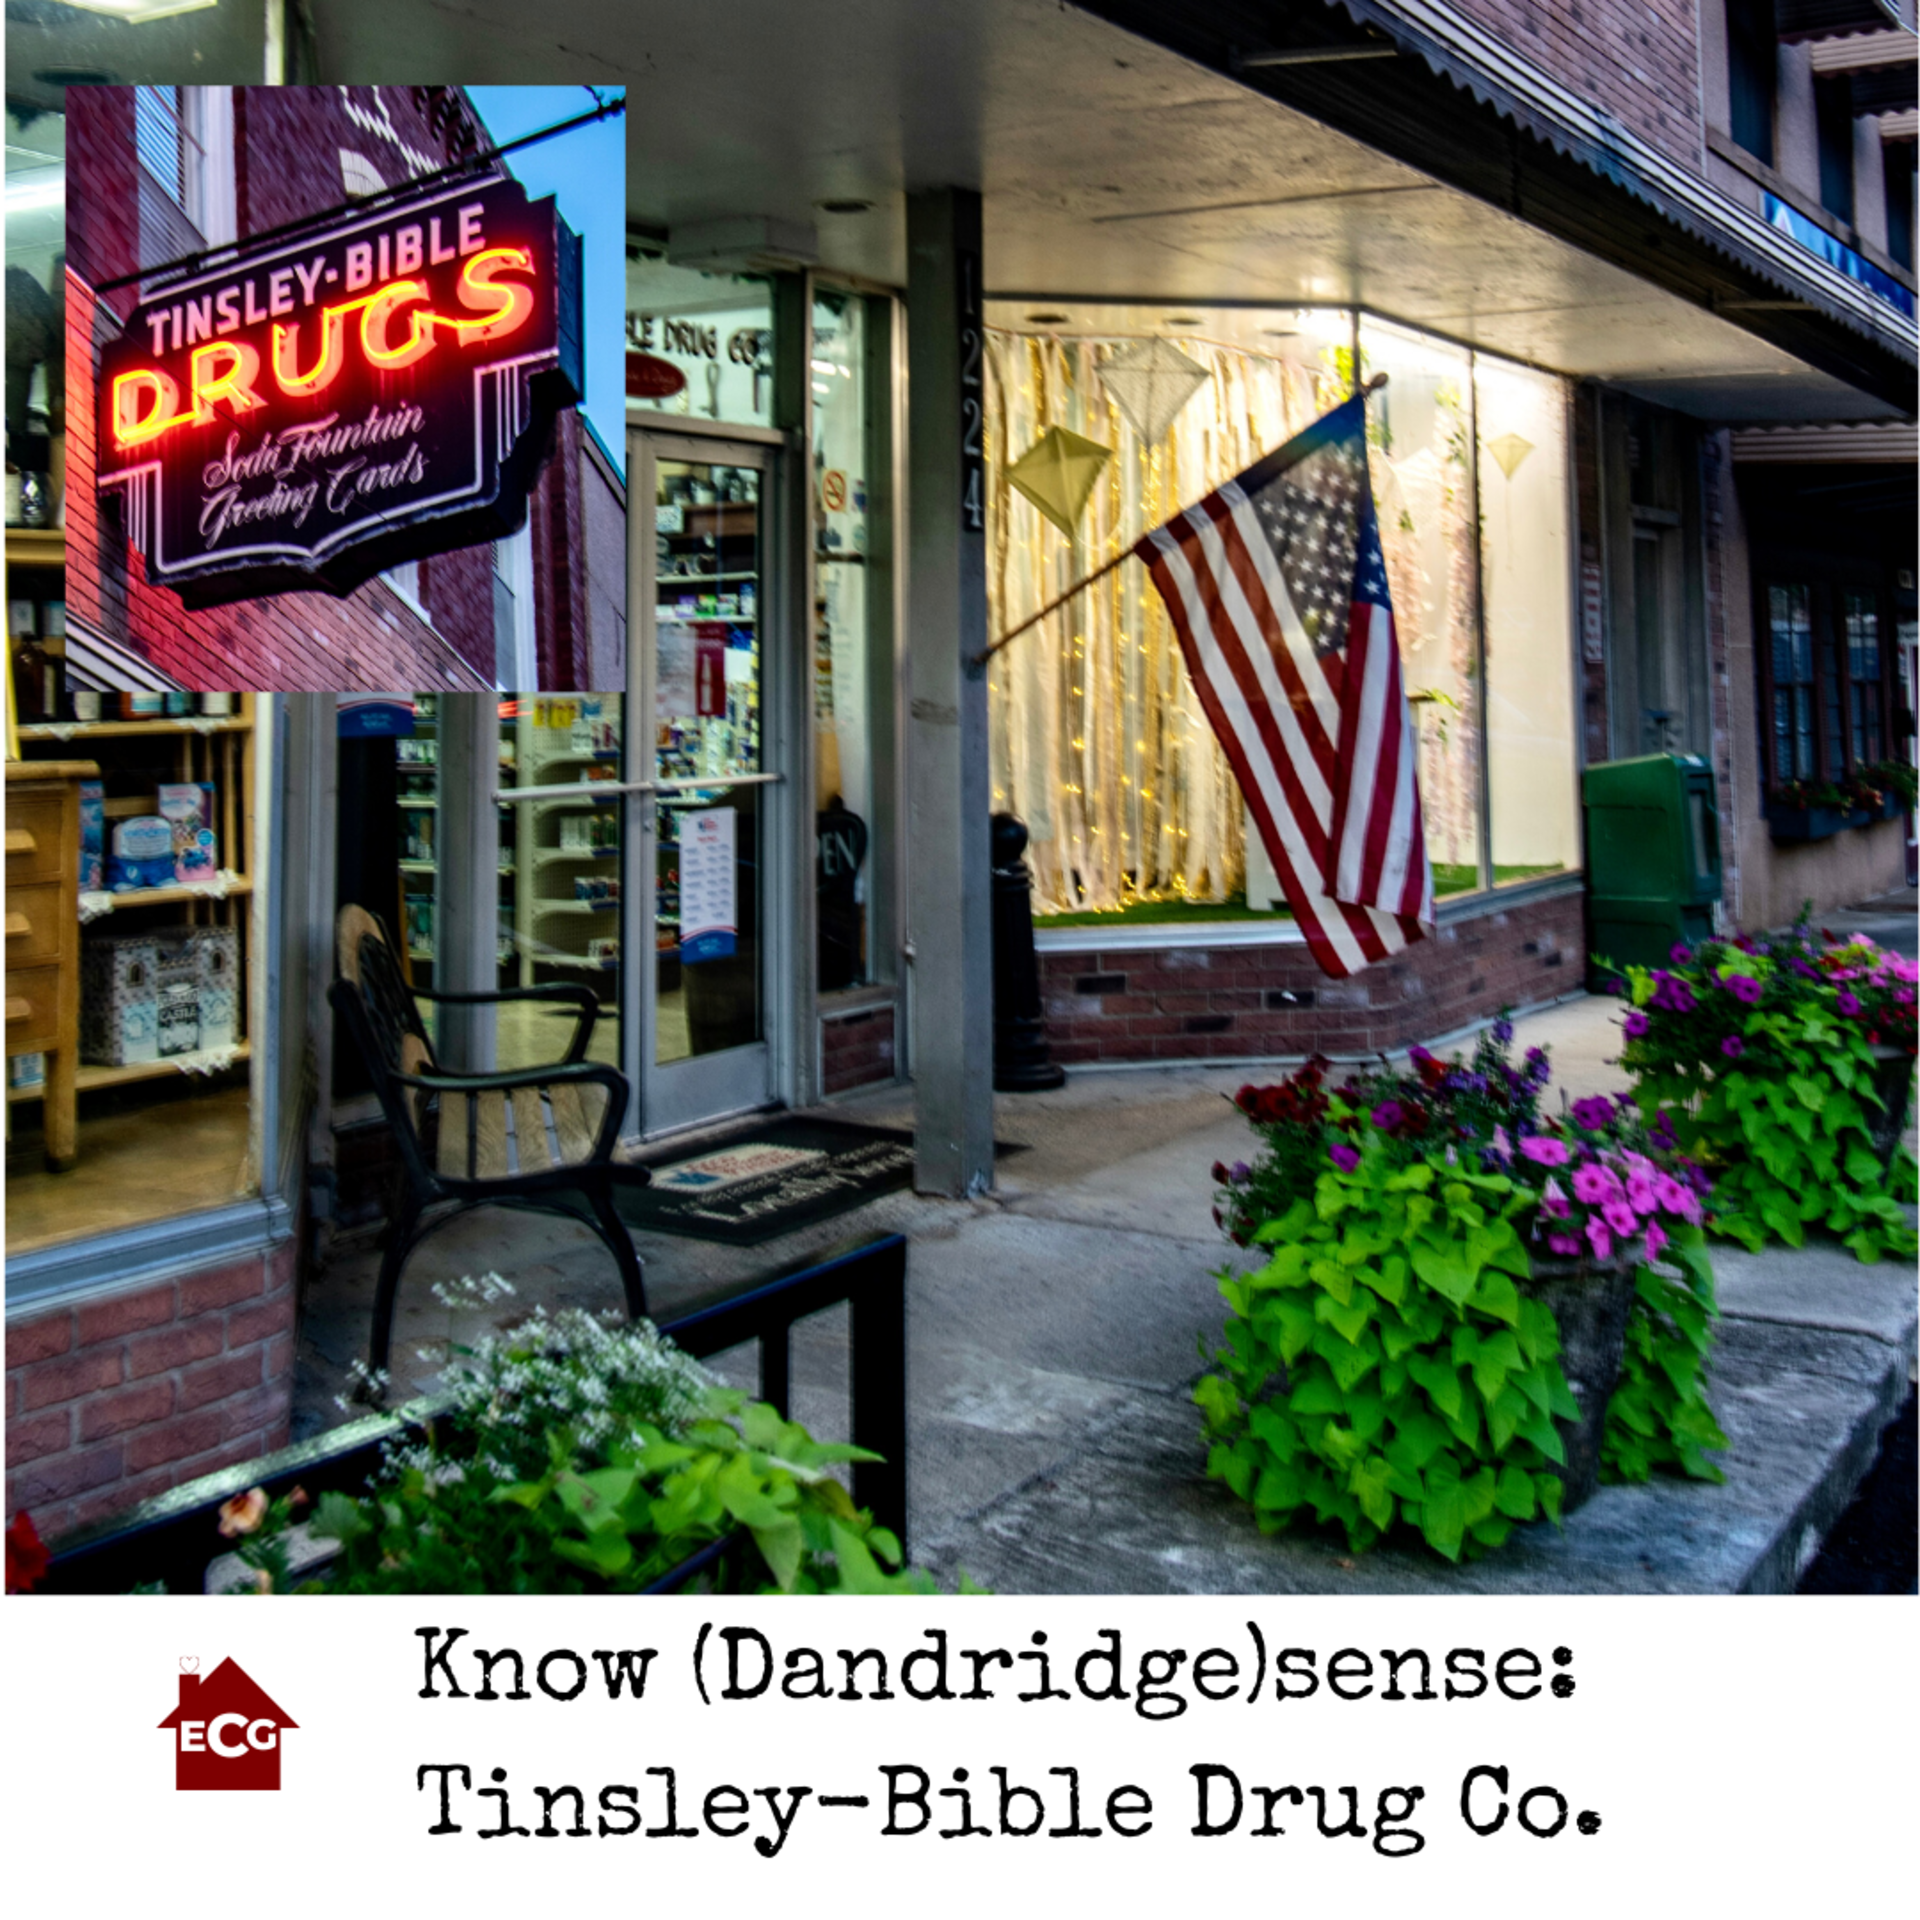 Know Knoxsense: Tinsley- Bible Drug Co.